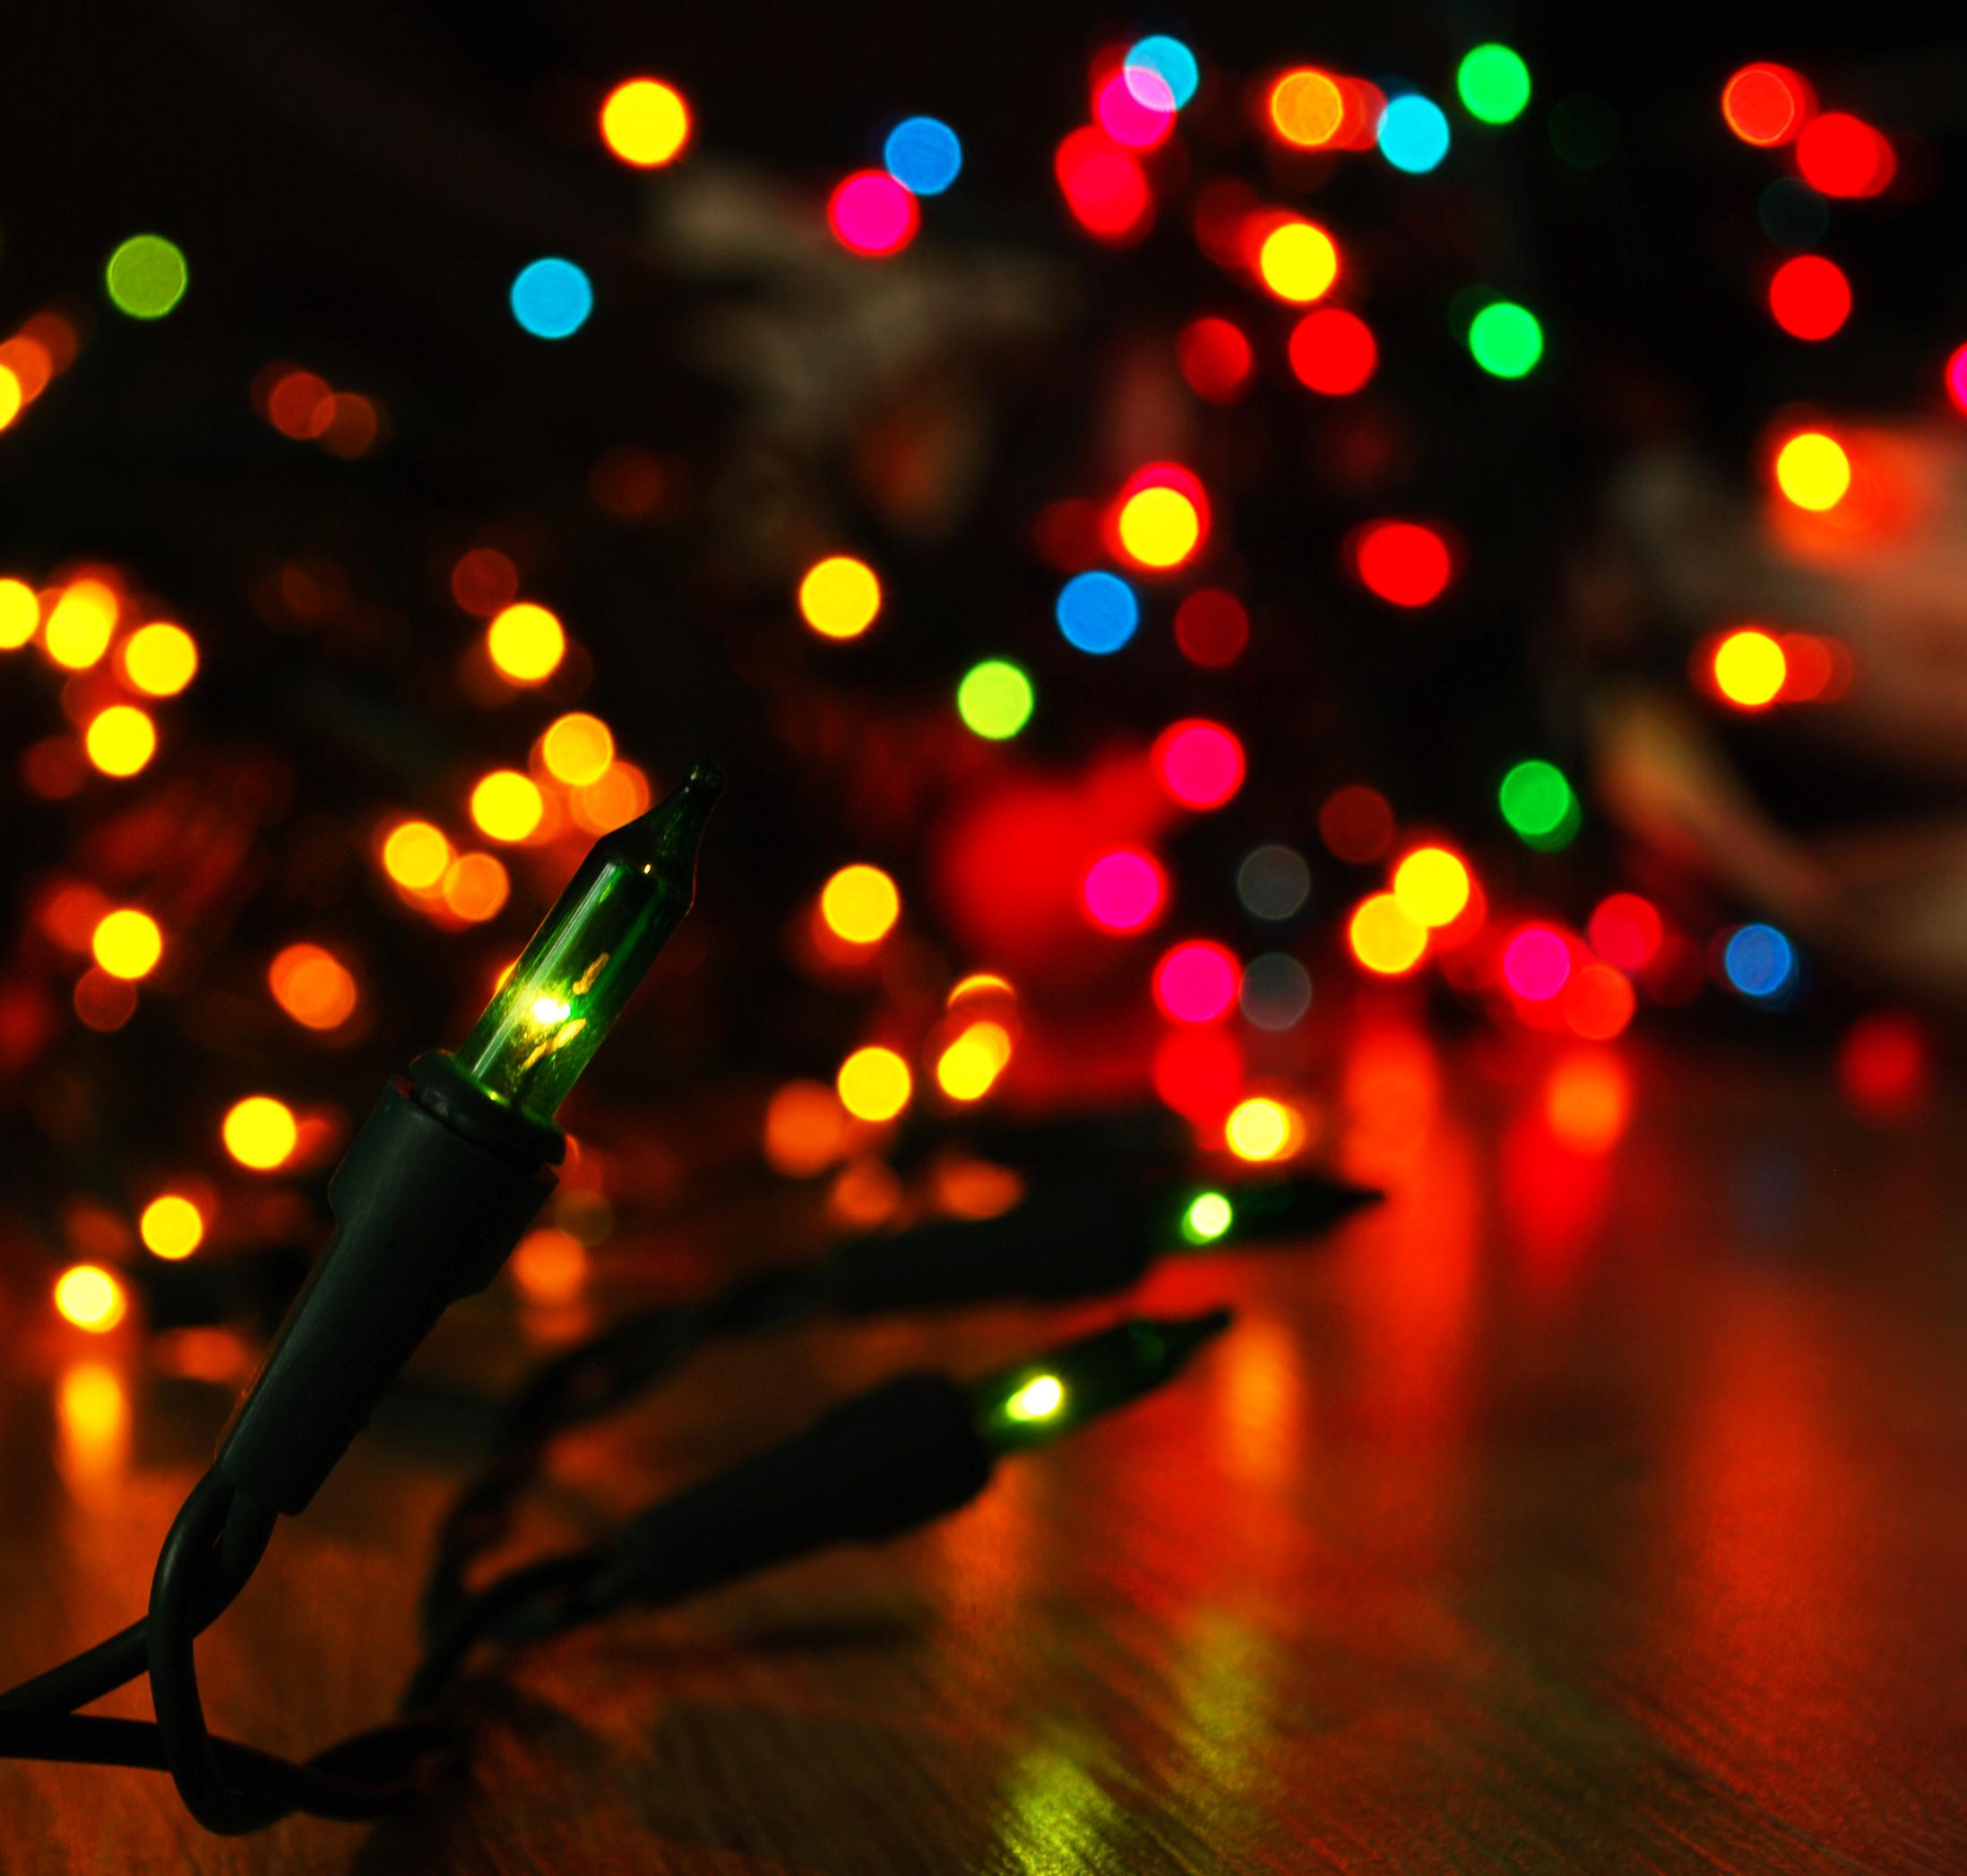 Google xmas themes - Christmas Lights Rainbow Google Wallpapers Christmas Lights Rainbow